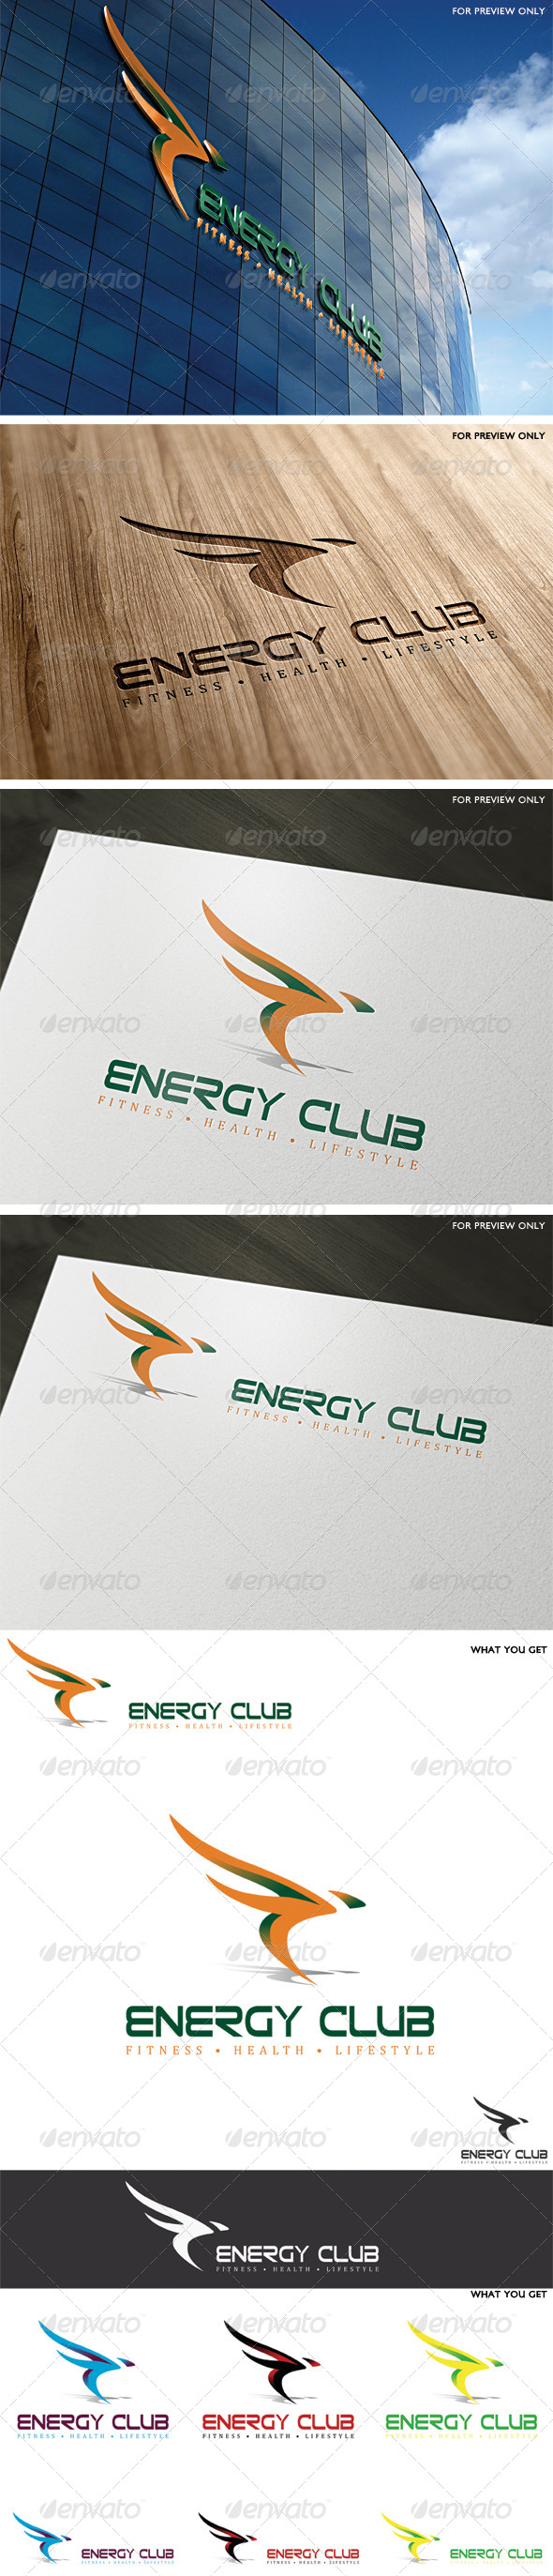 Energy Club Logo Template - Vector Abstract